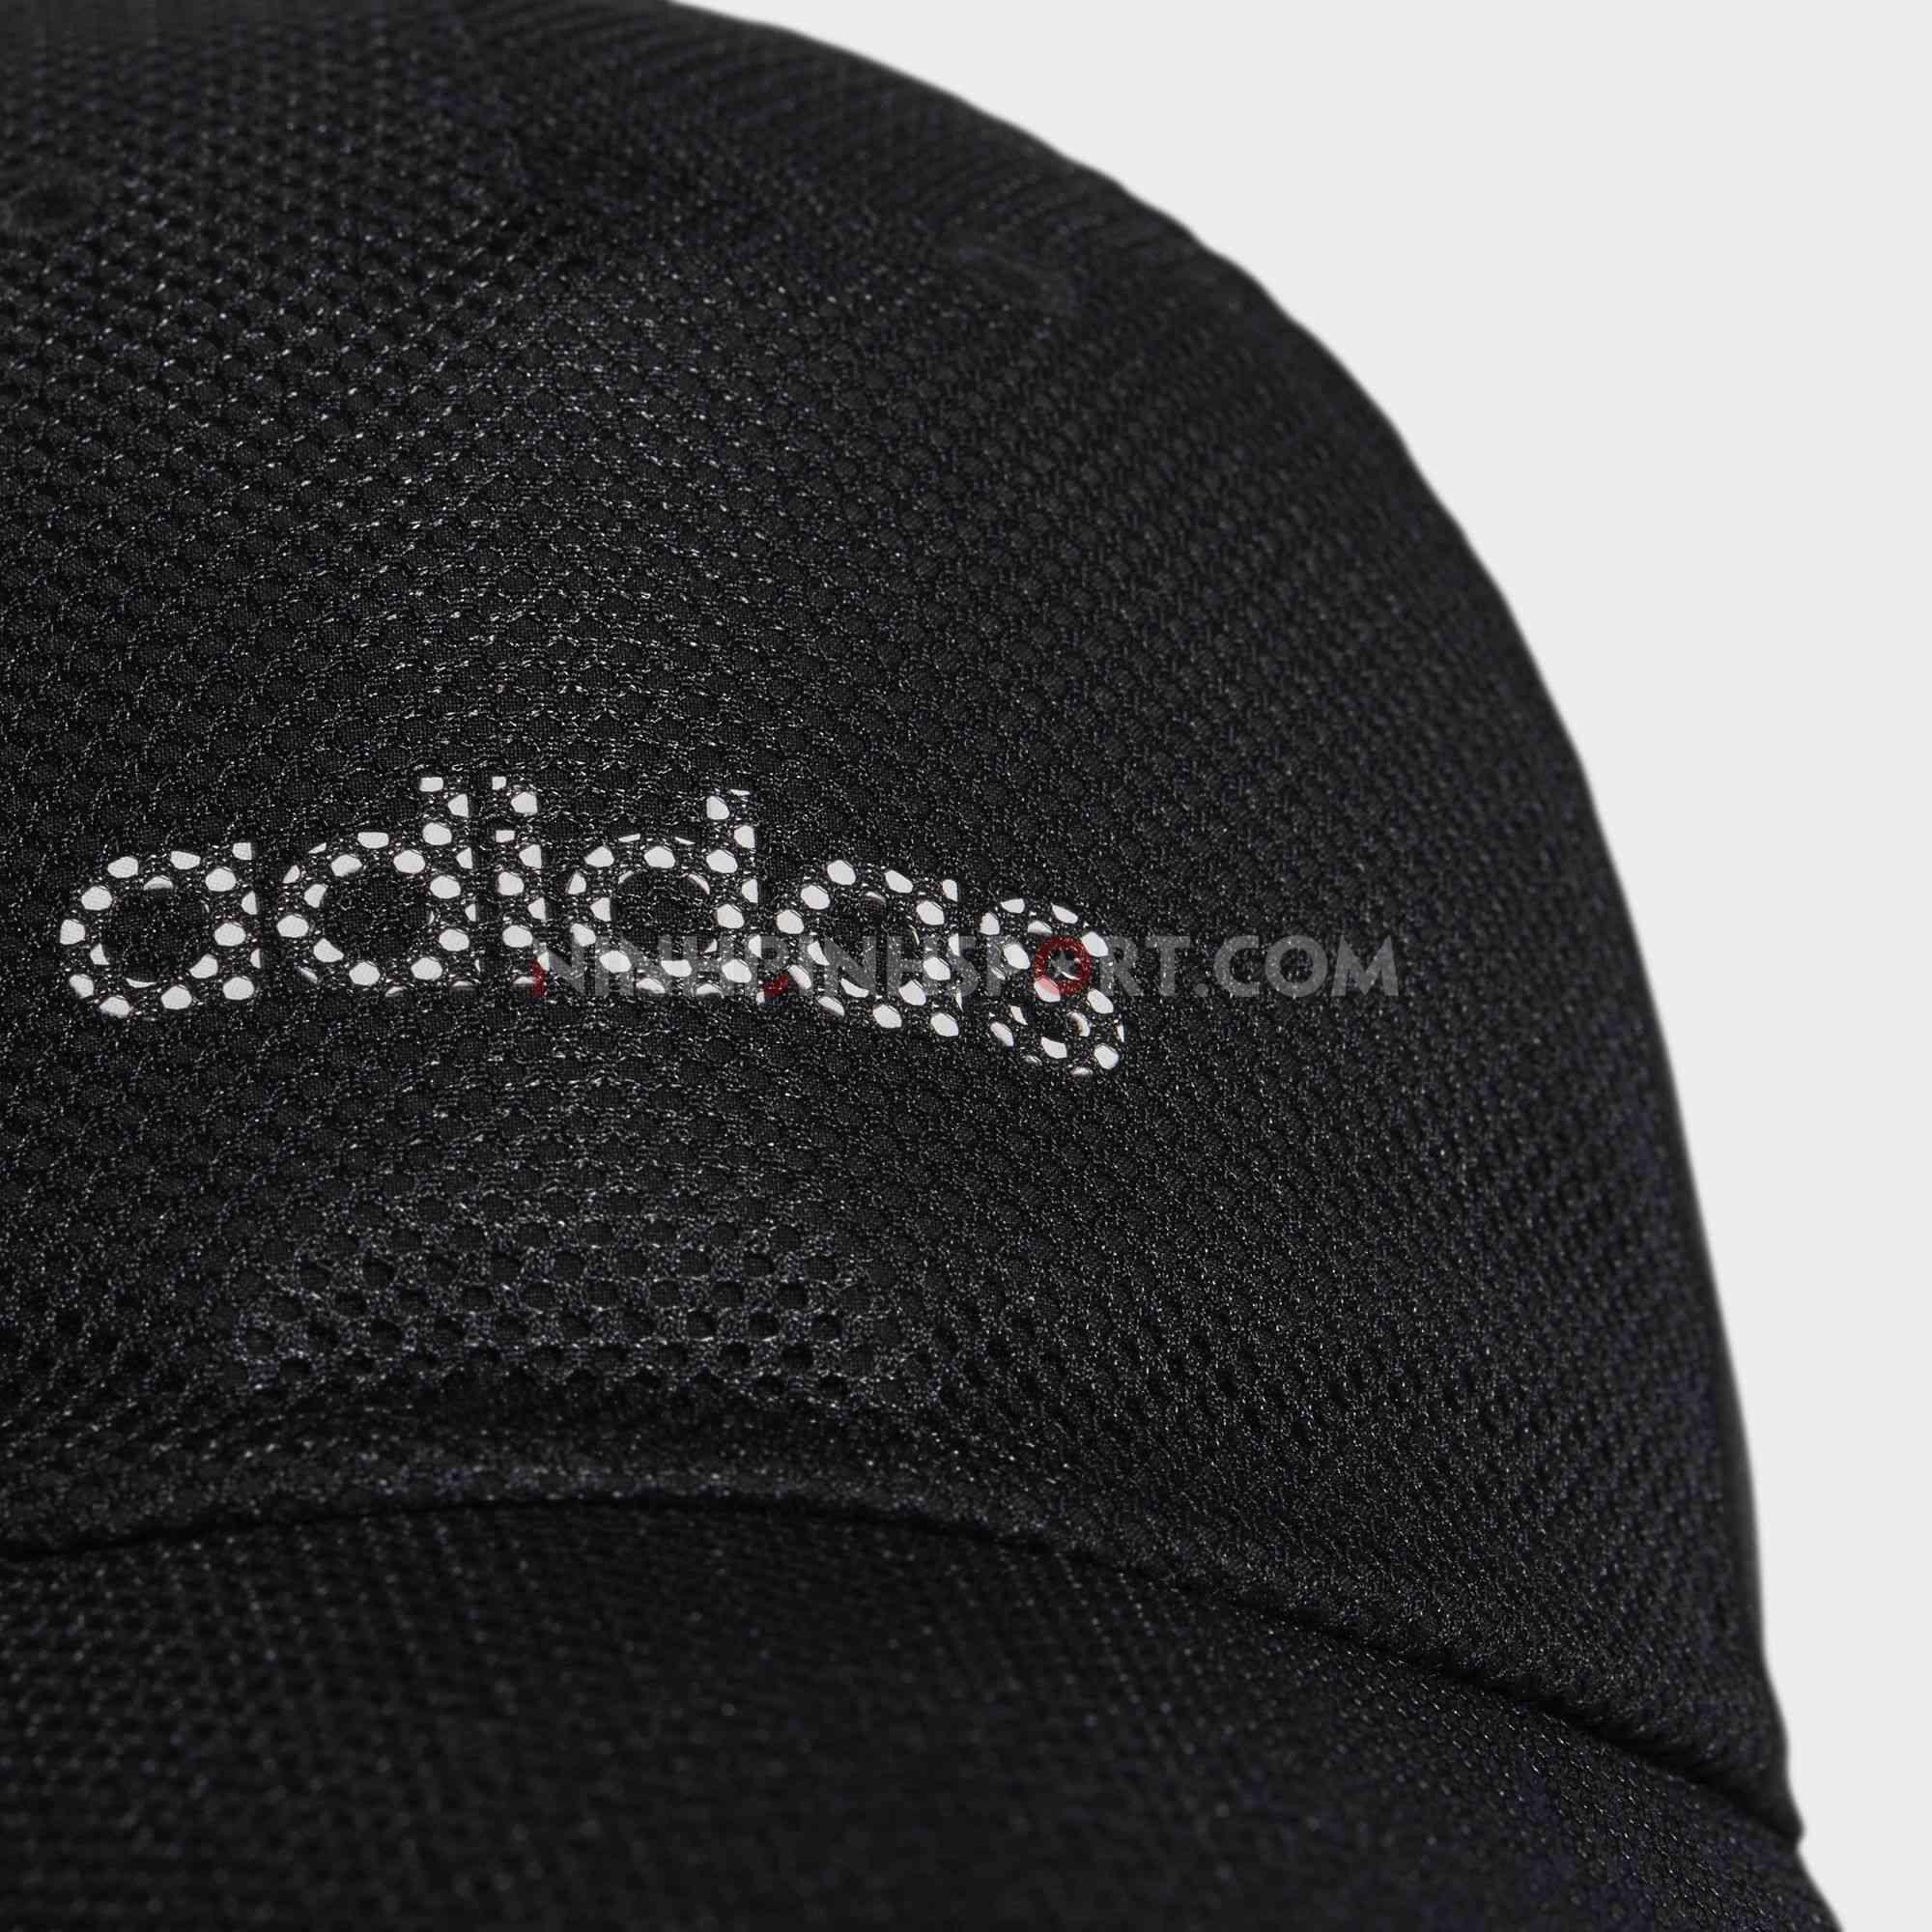 Mũ thể thao nam Adidas C40 Light DW9050